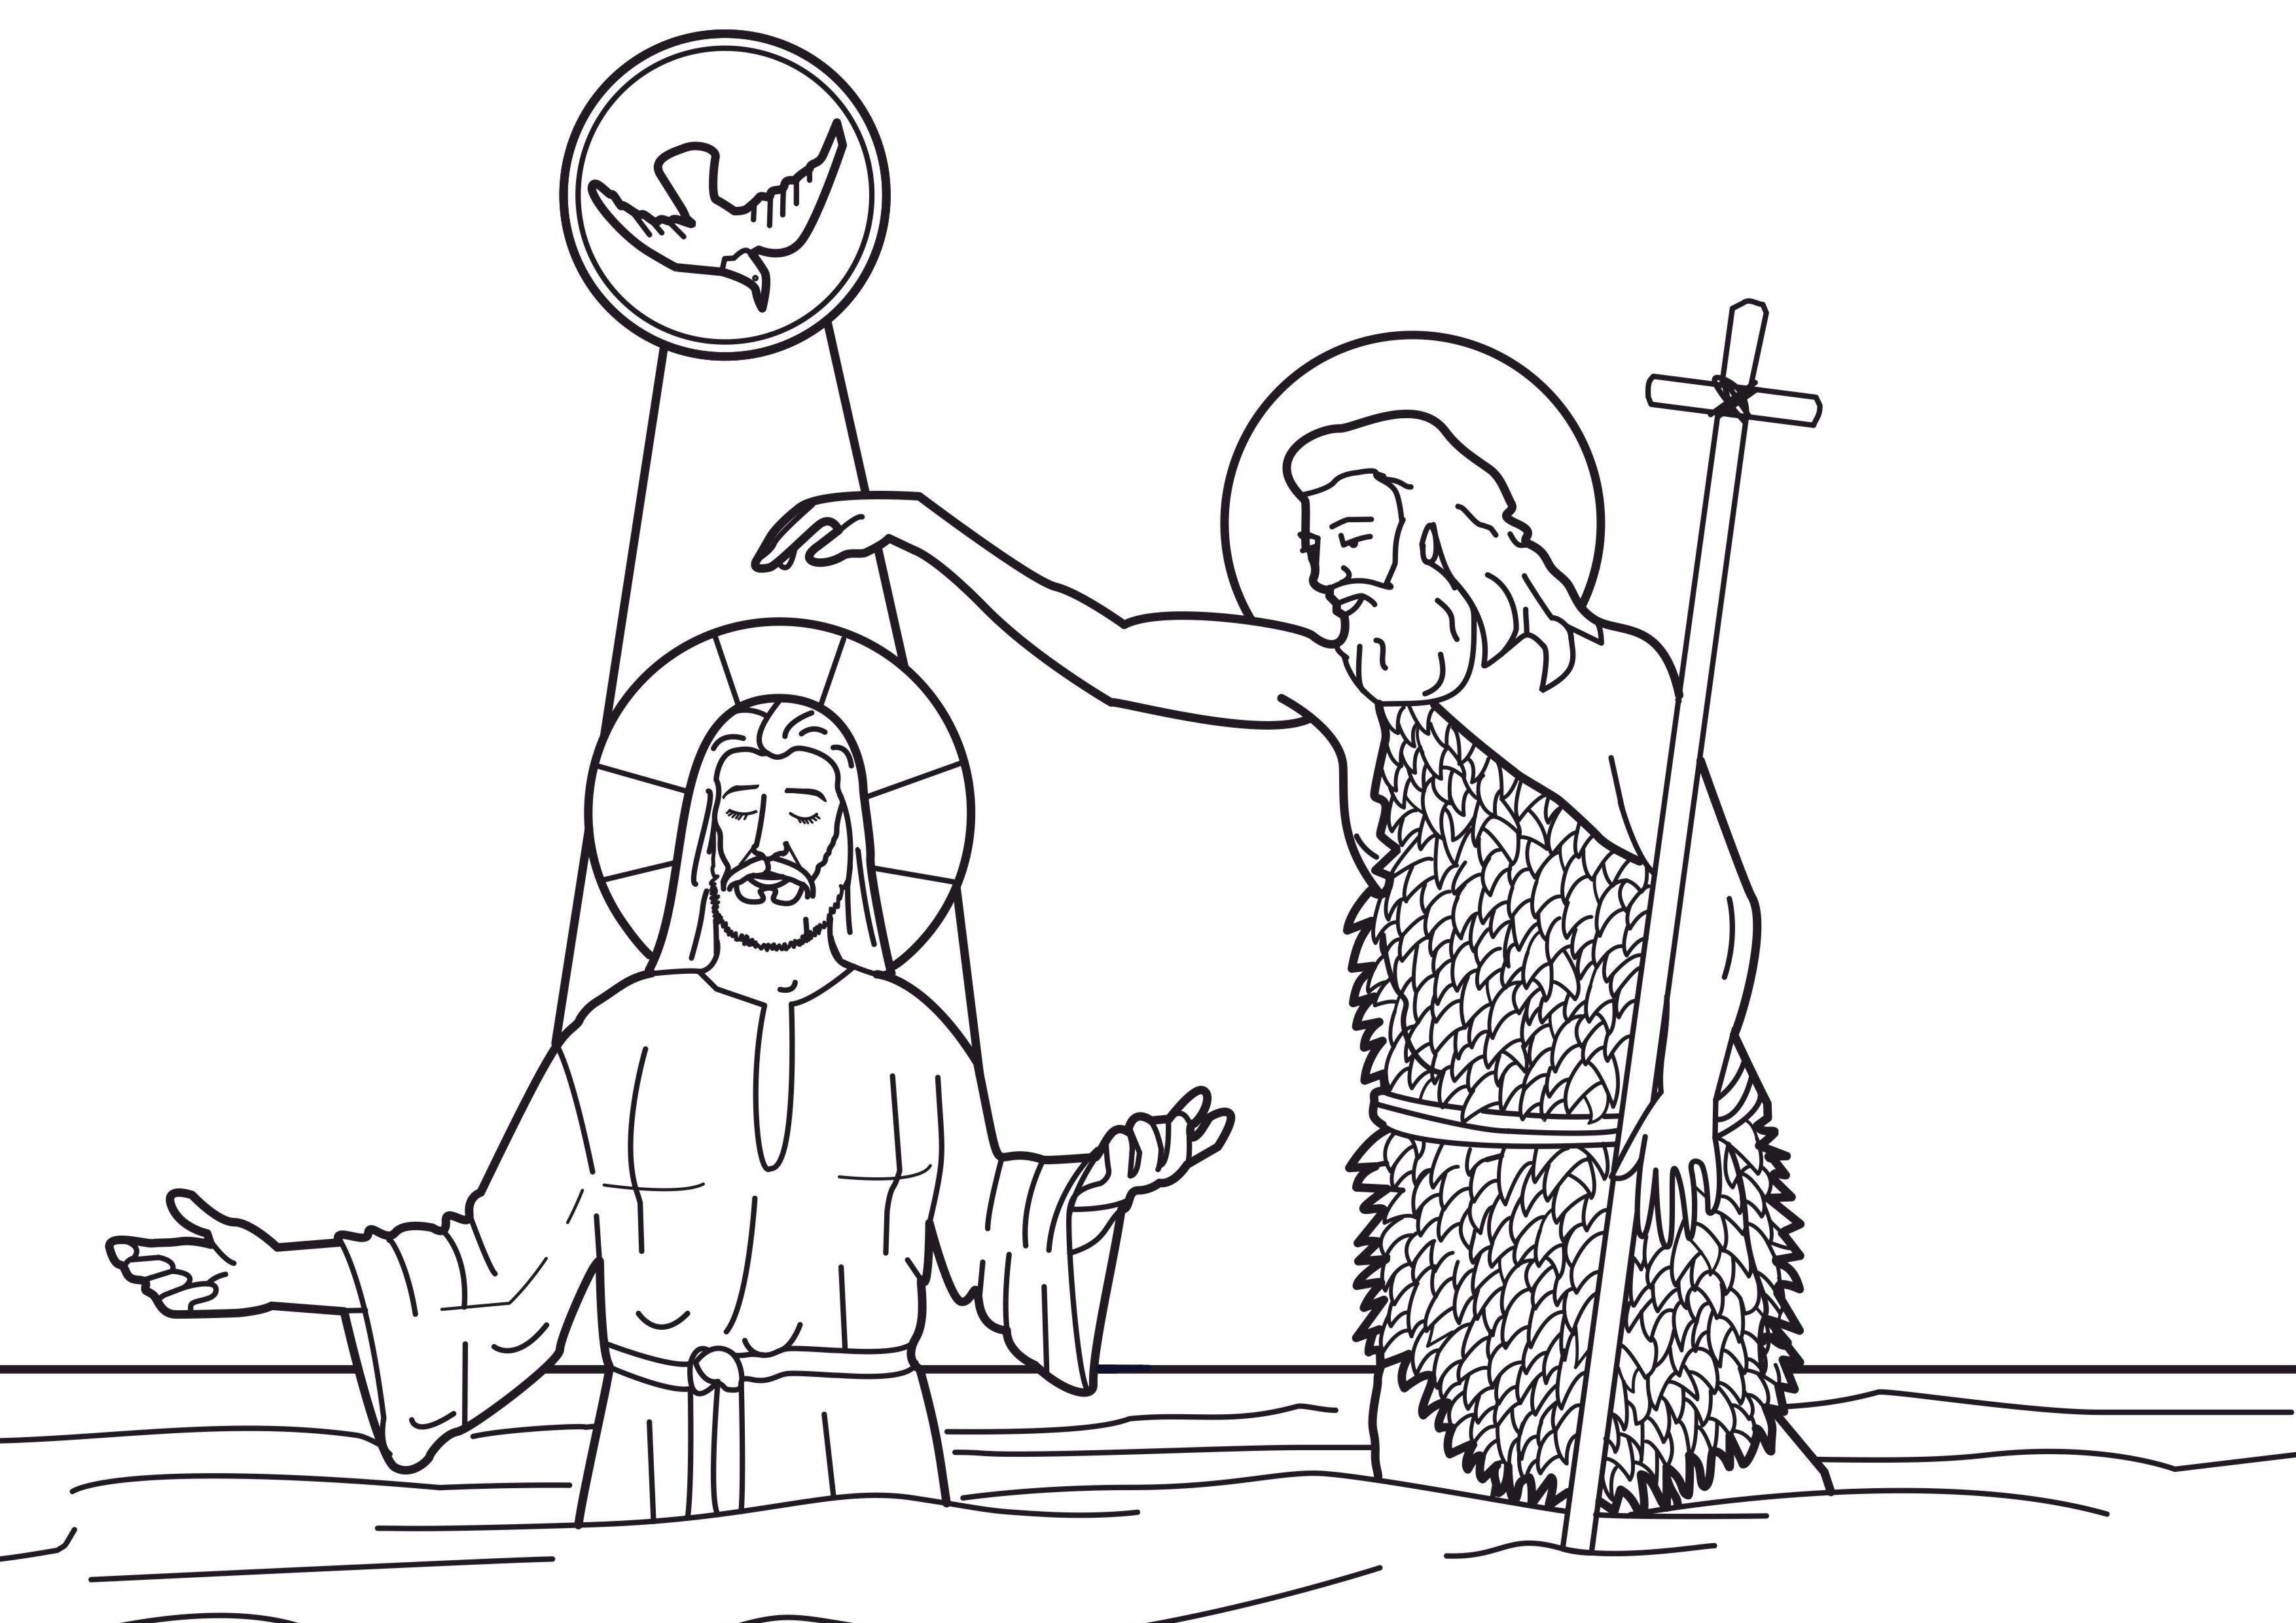 Baptism Of Christ In The River Jordan With Saint John The Baptist